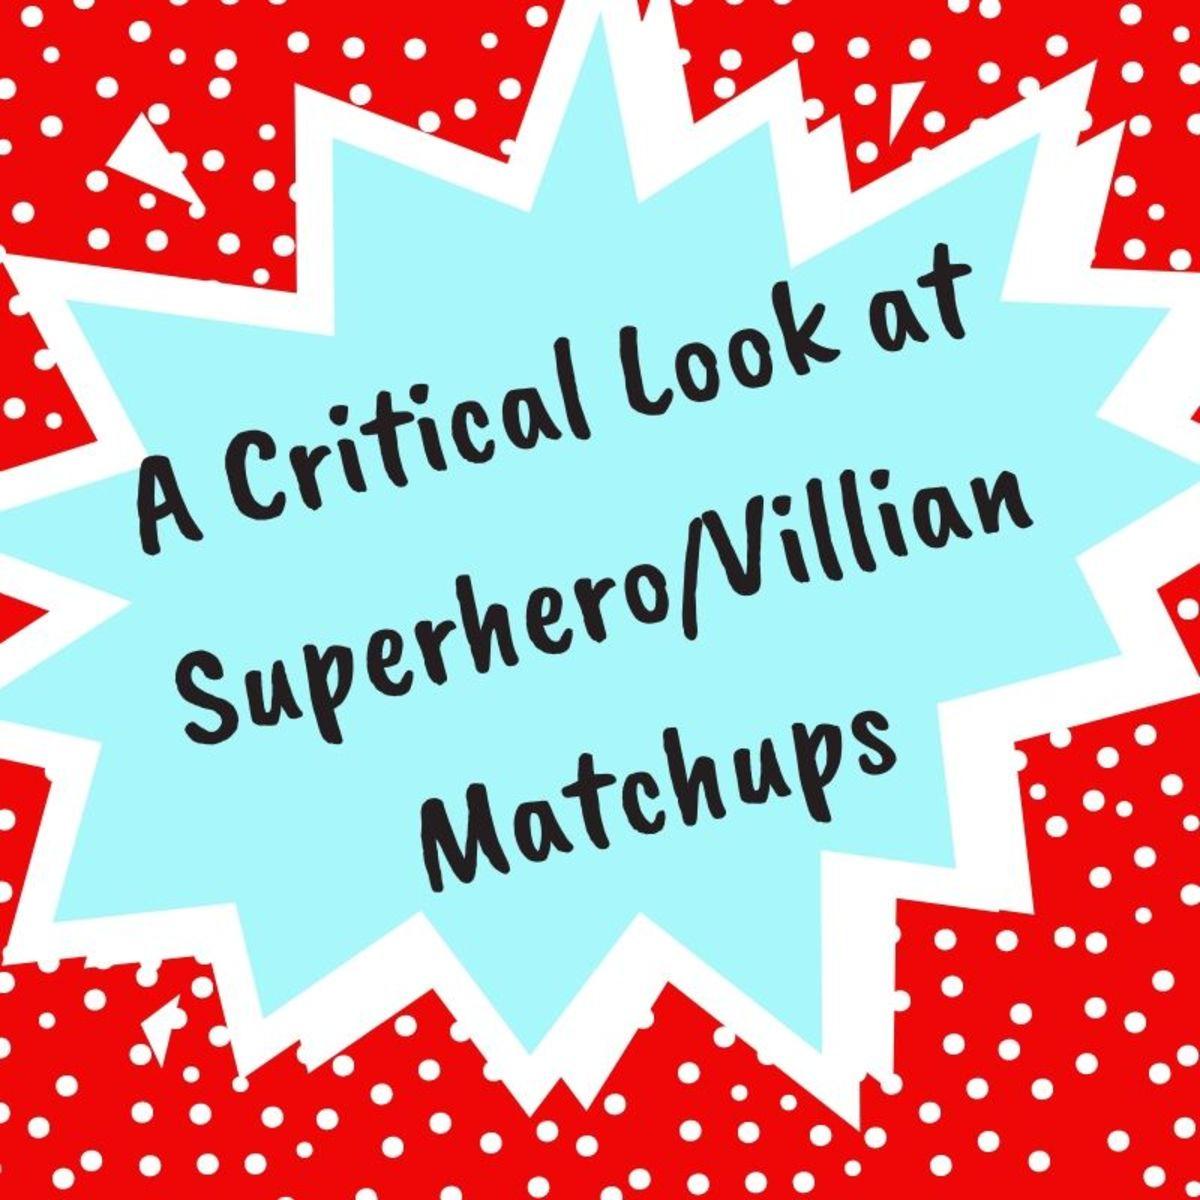 The Rise of Superhero/Super Villain Matchups